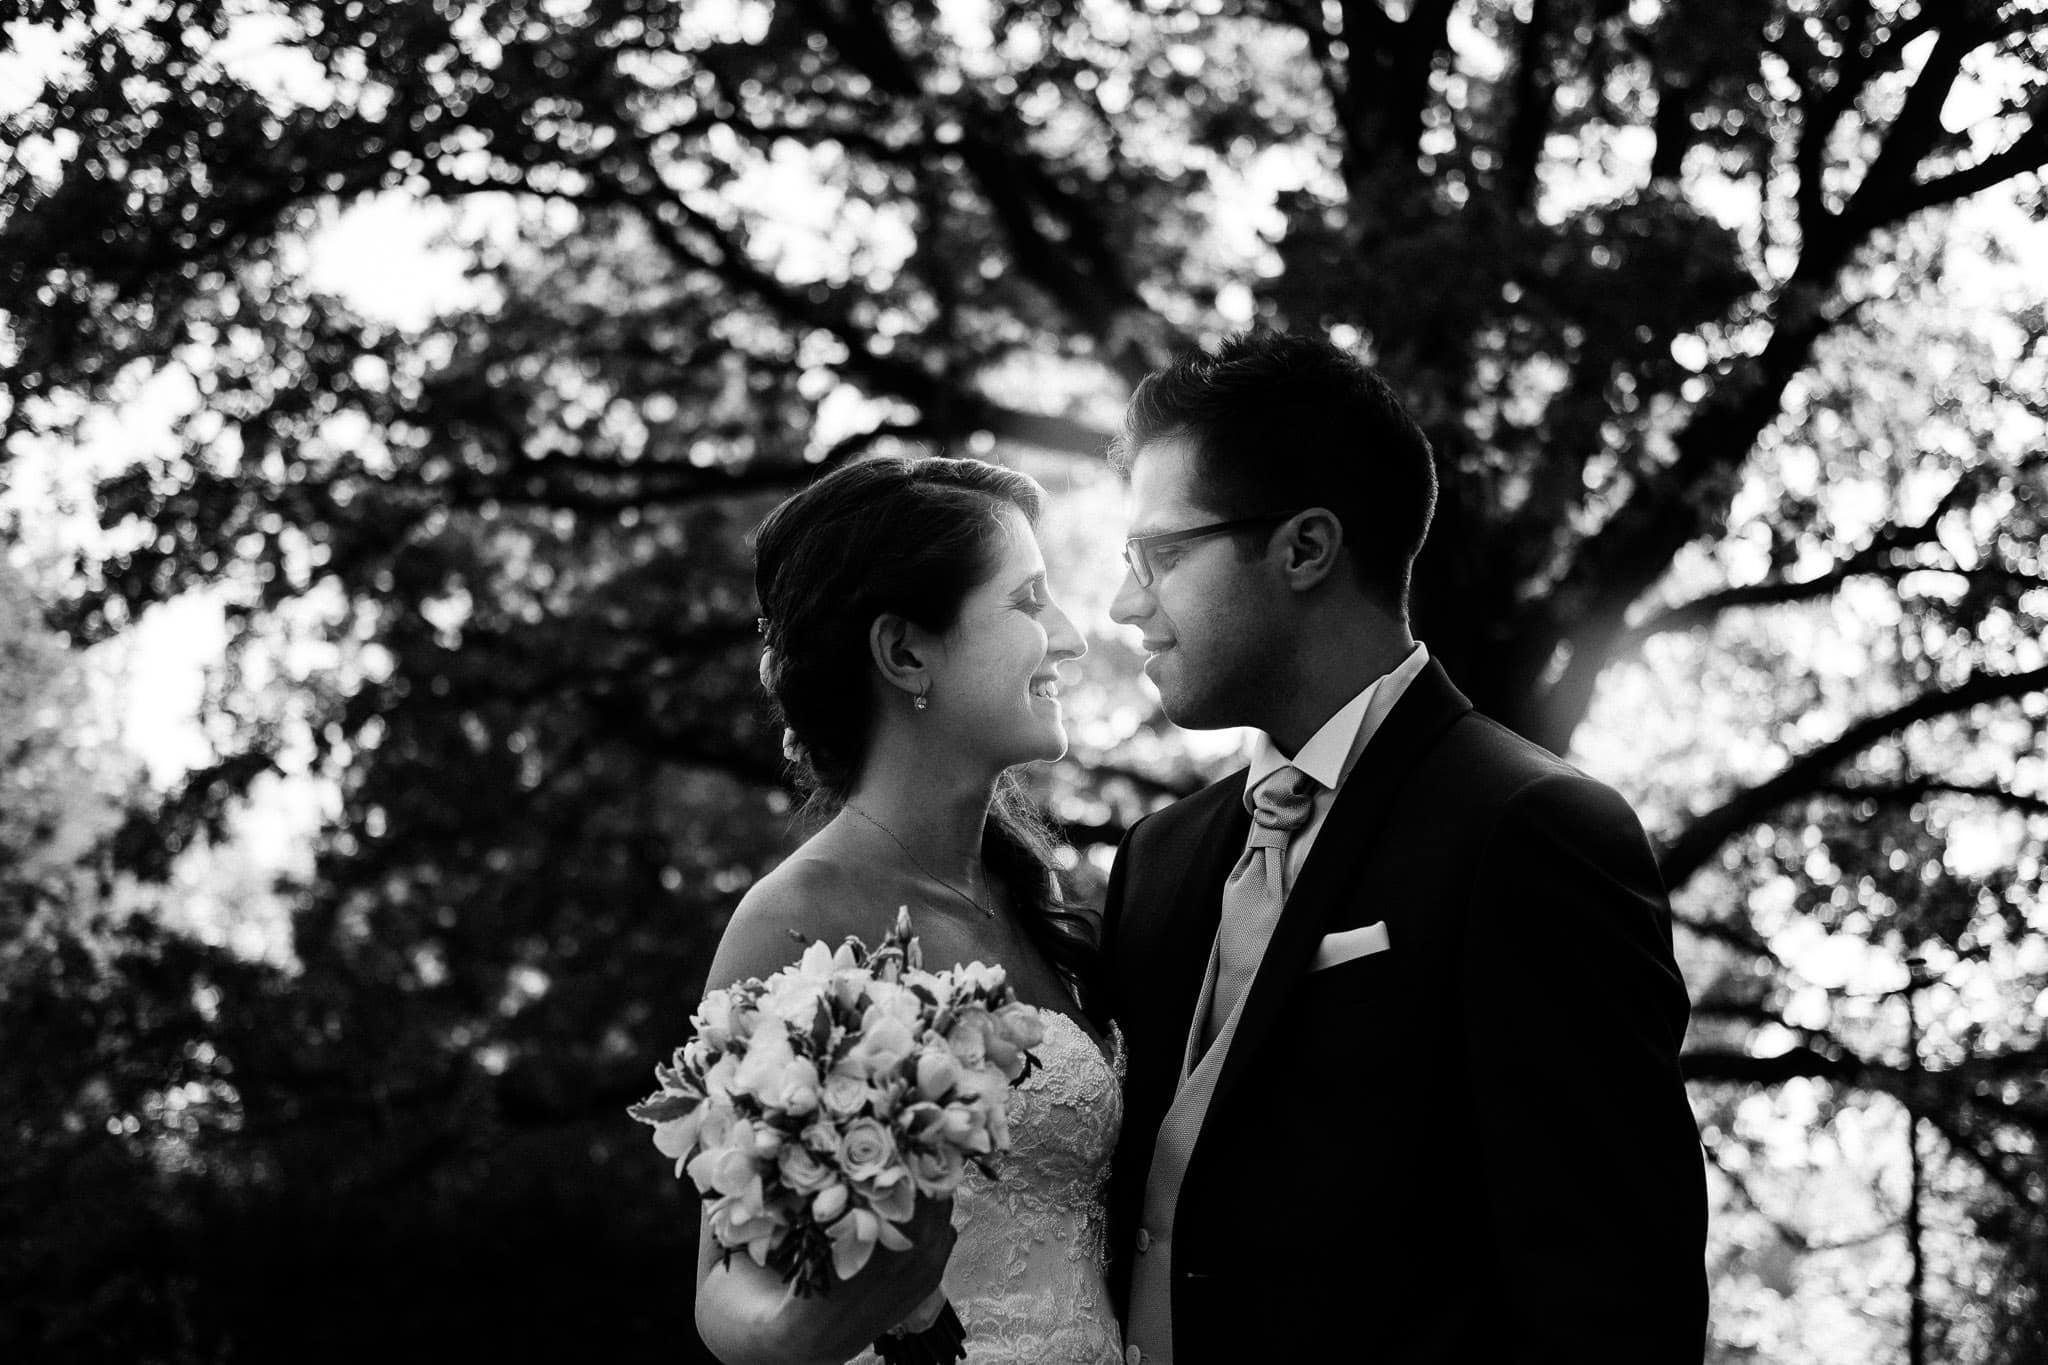 fotografo matrimonio cascina diodona varese lucarossifoto 00016